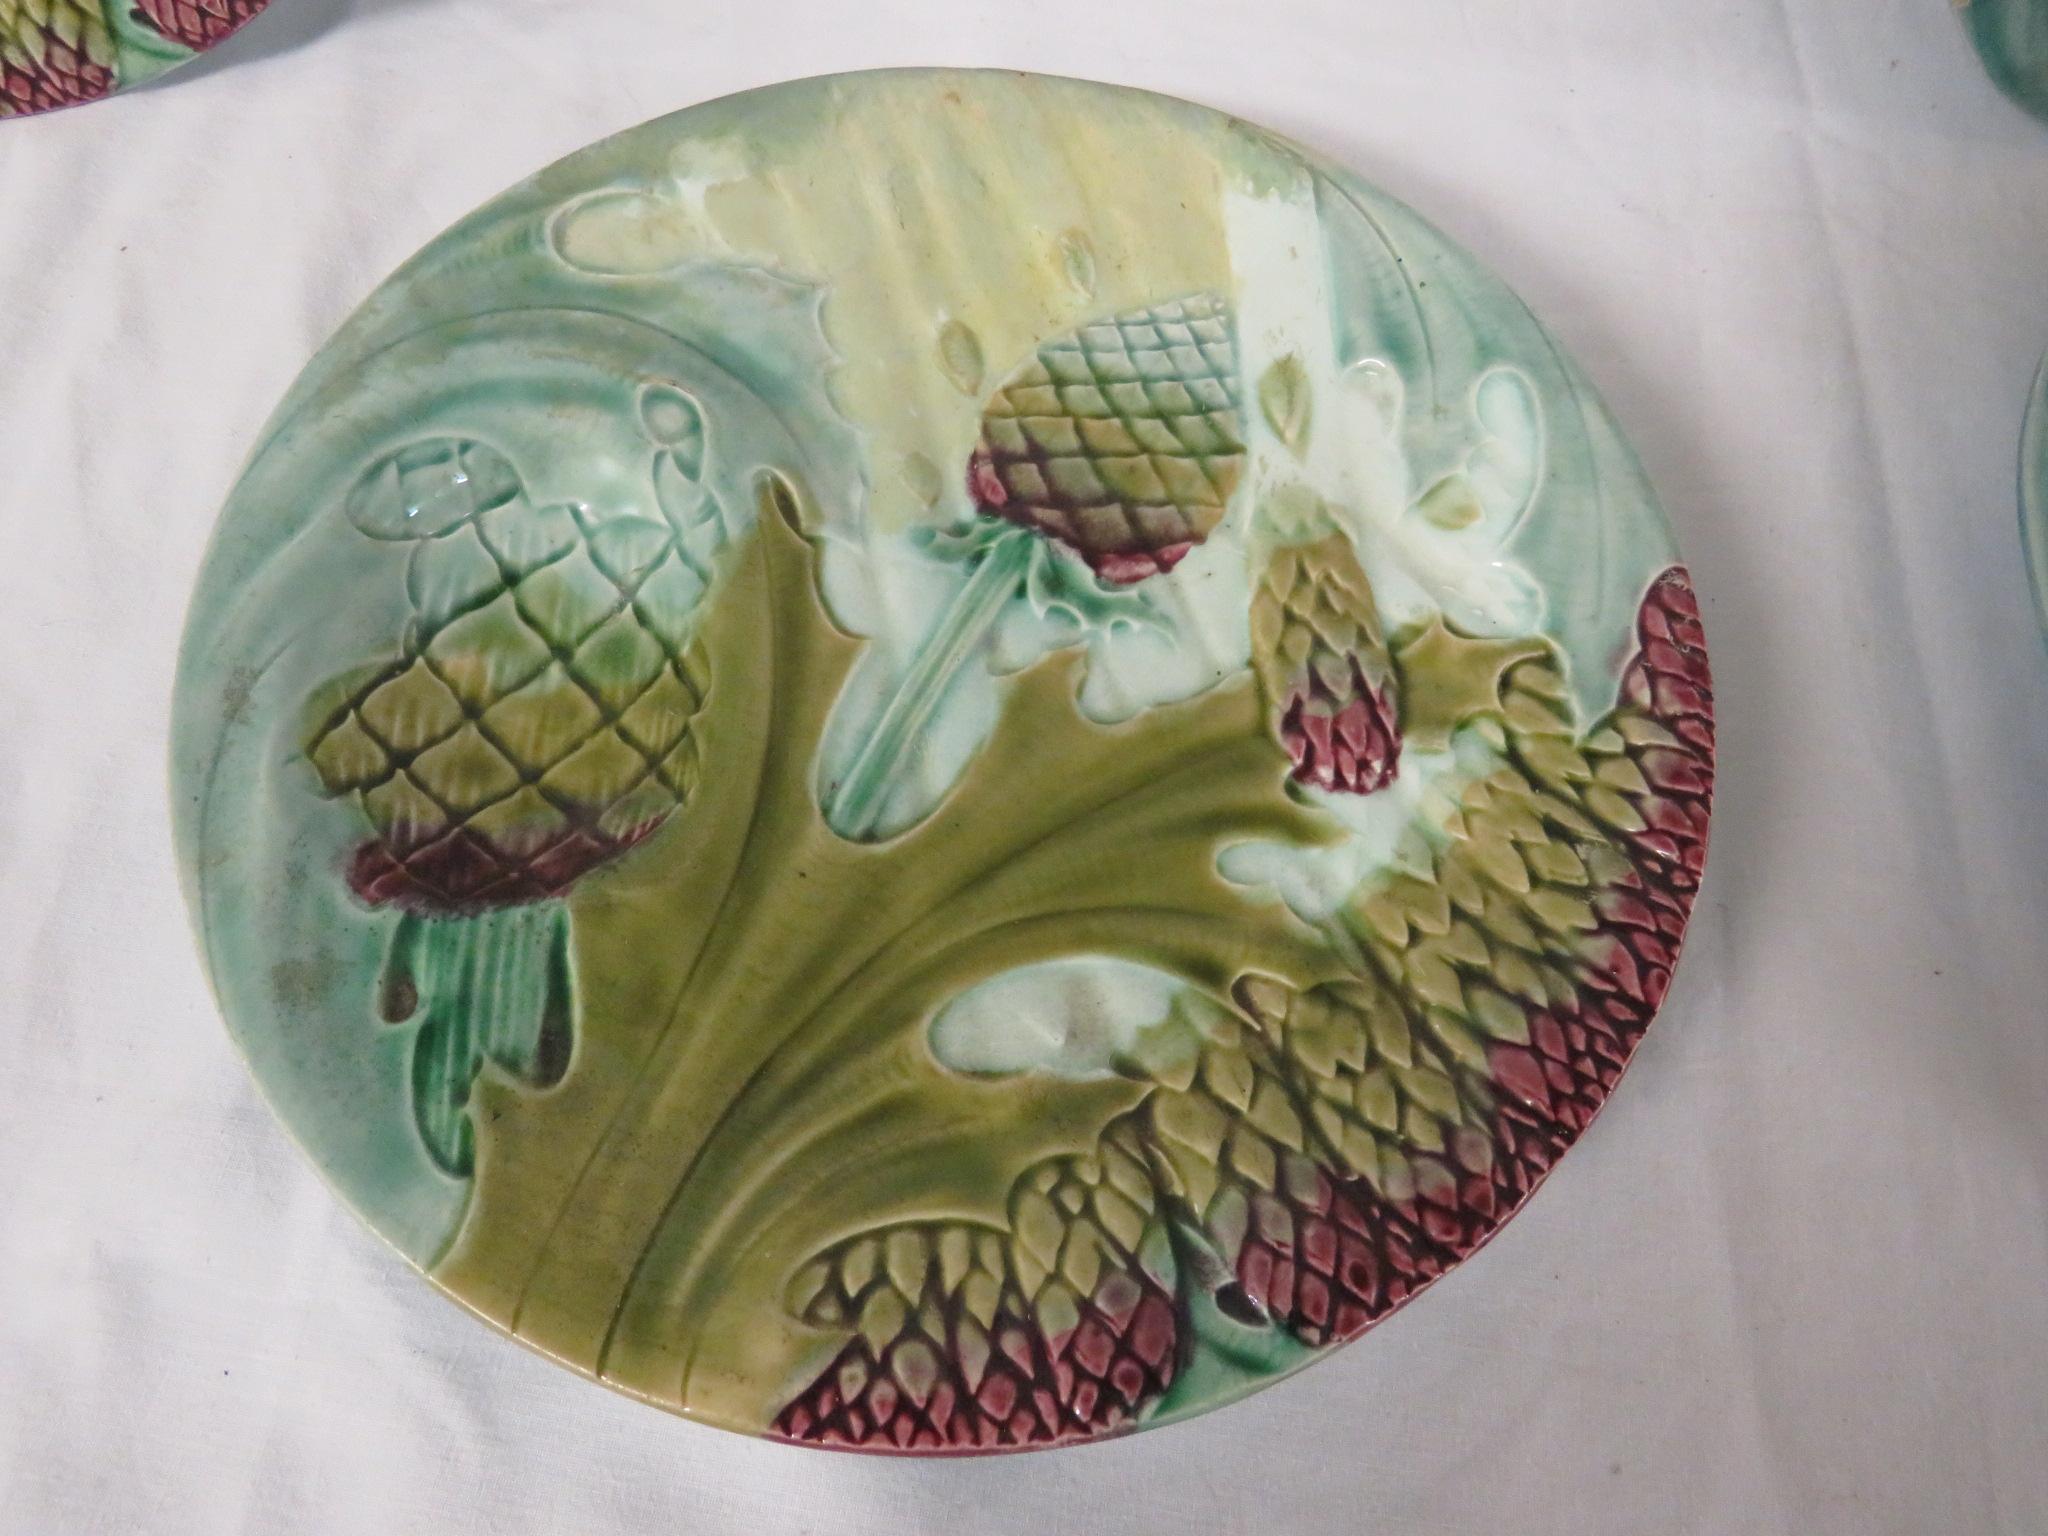 Lot 56 - Six majolica asparagus plates, diameter 23cm, stamped Depose Luneville